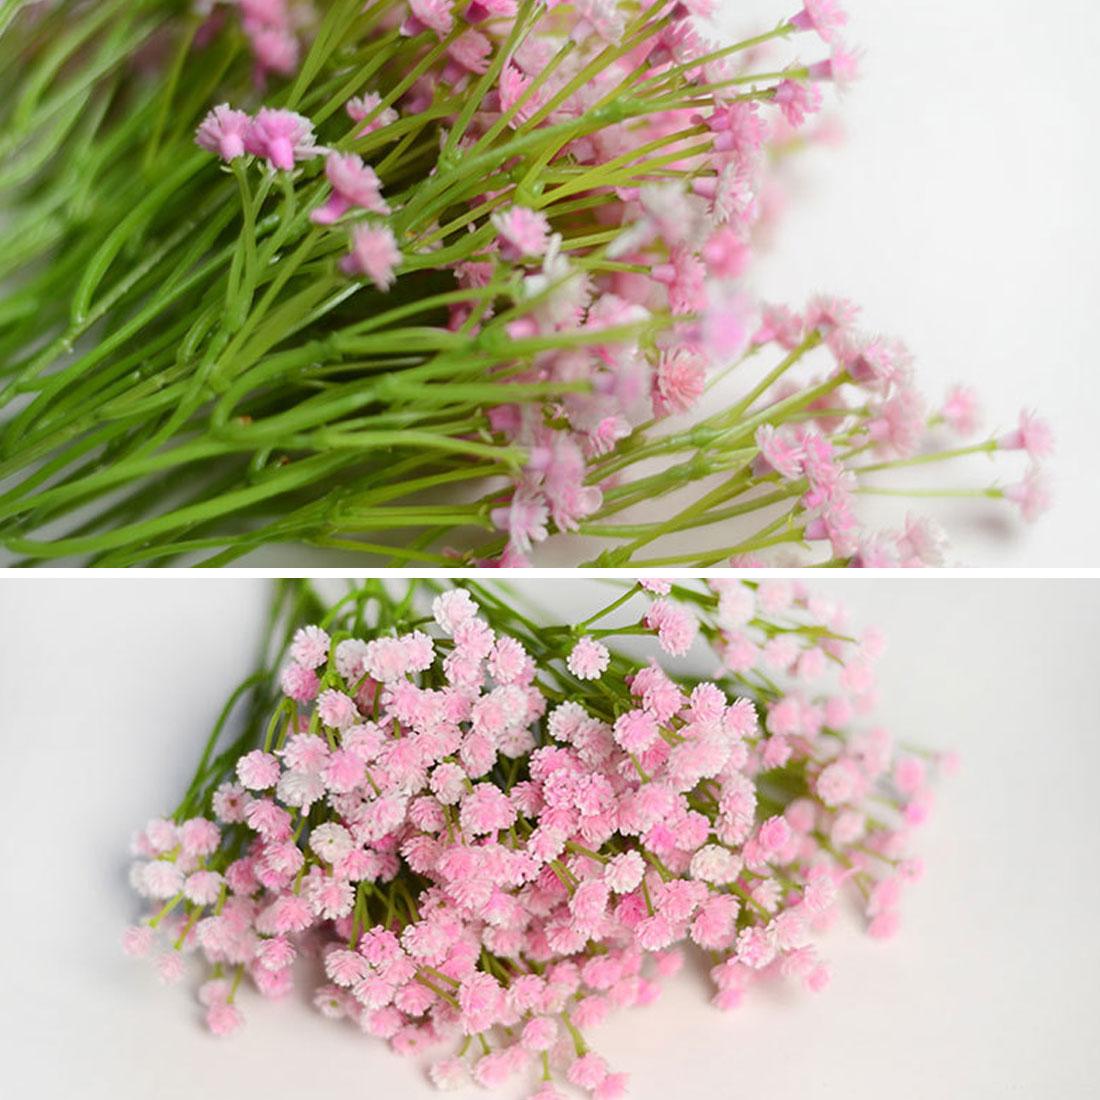 Artificial Flower Decoration 7 Bifurcation Bouquet Babysbreath Fake